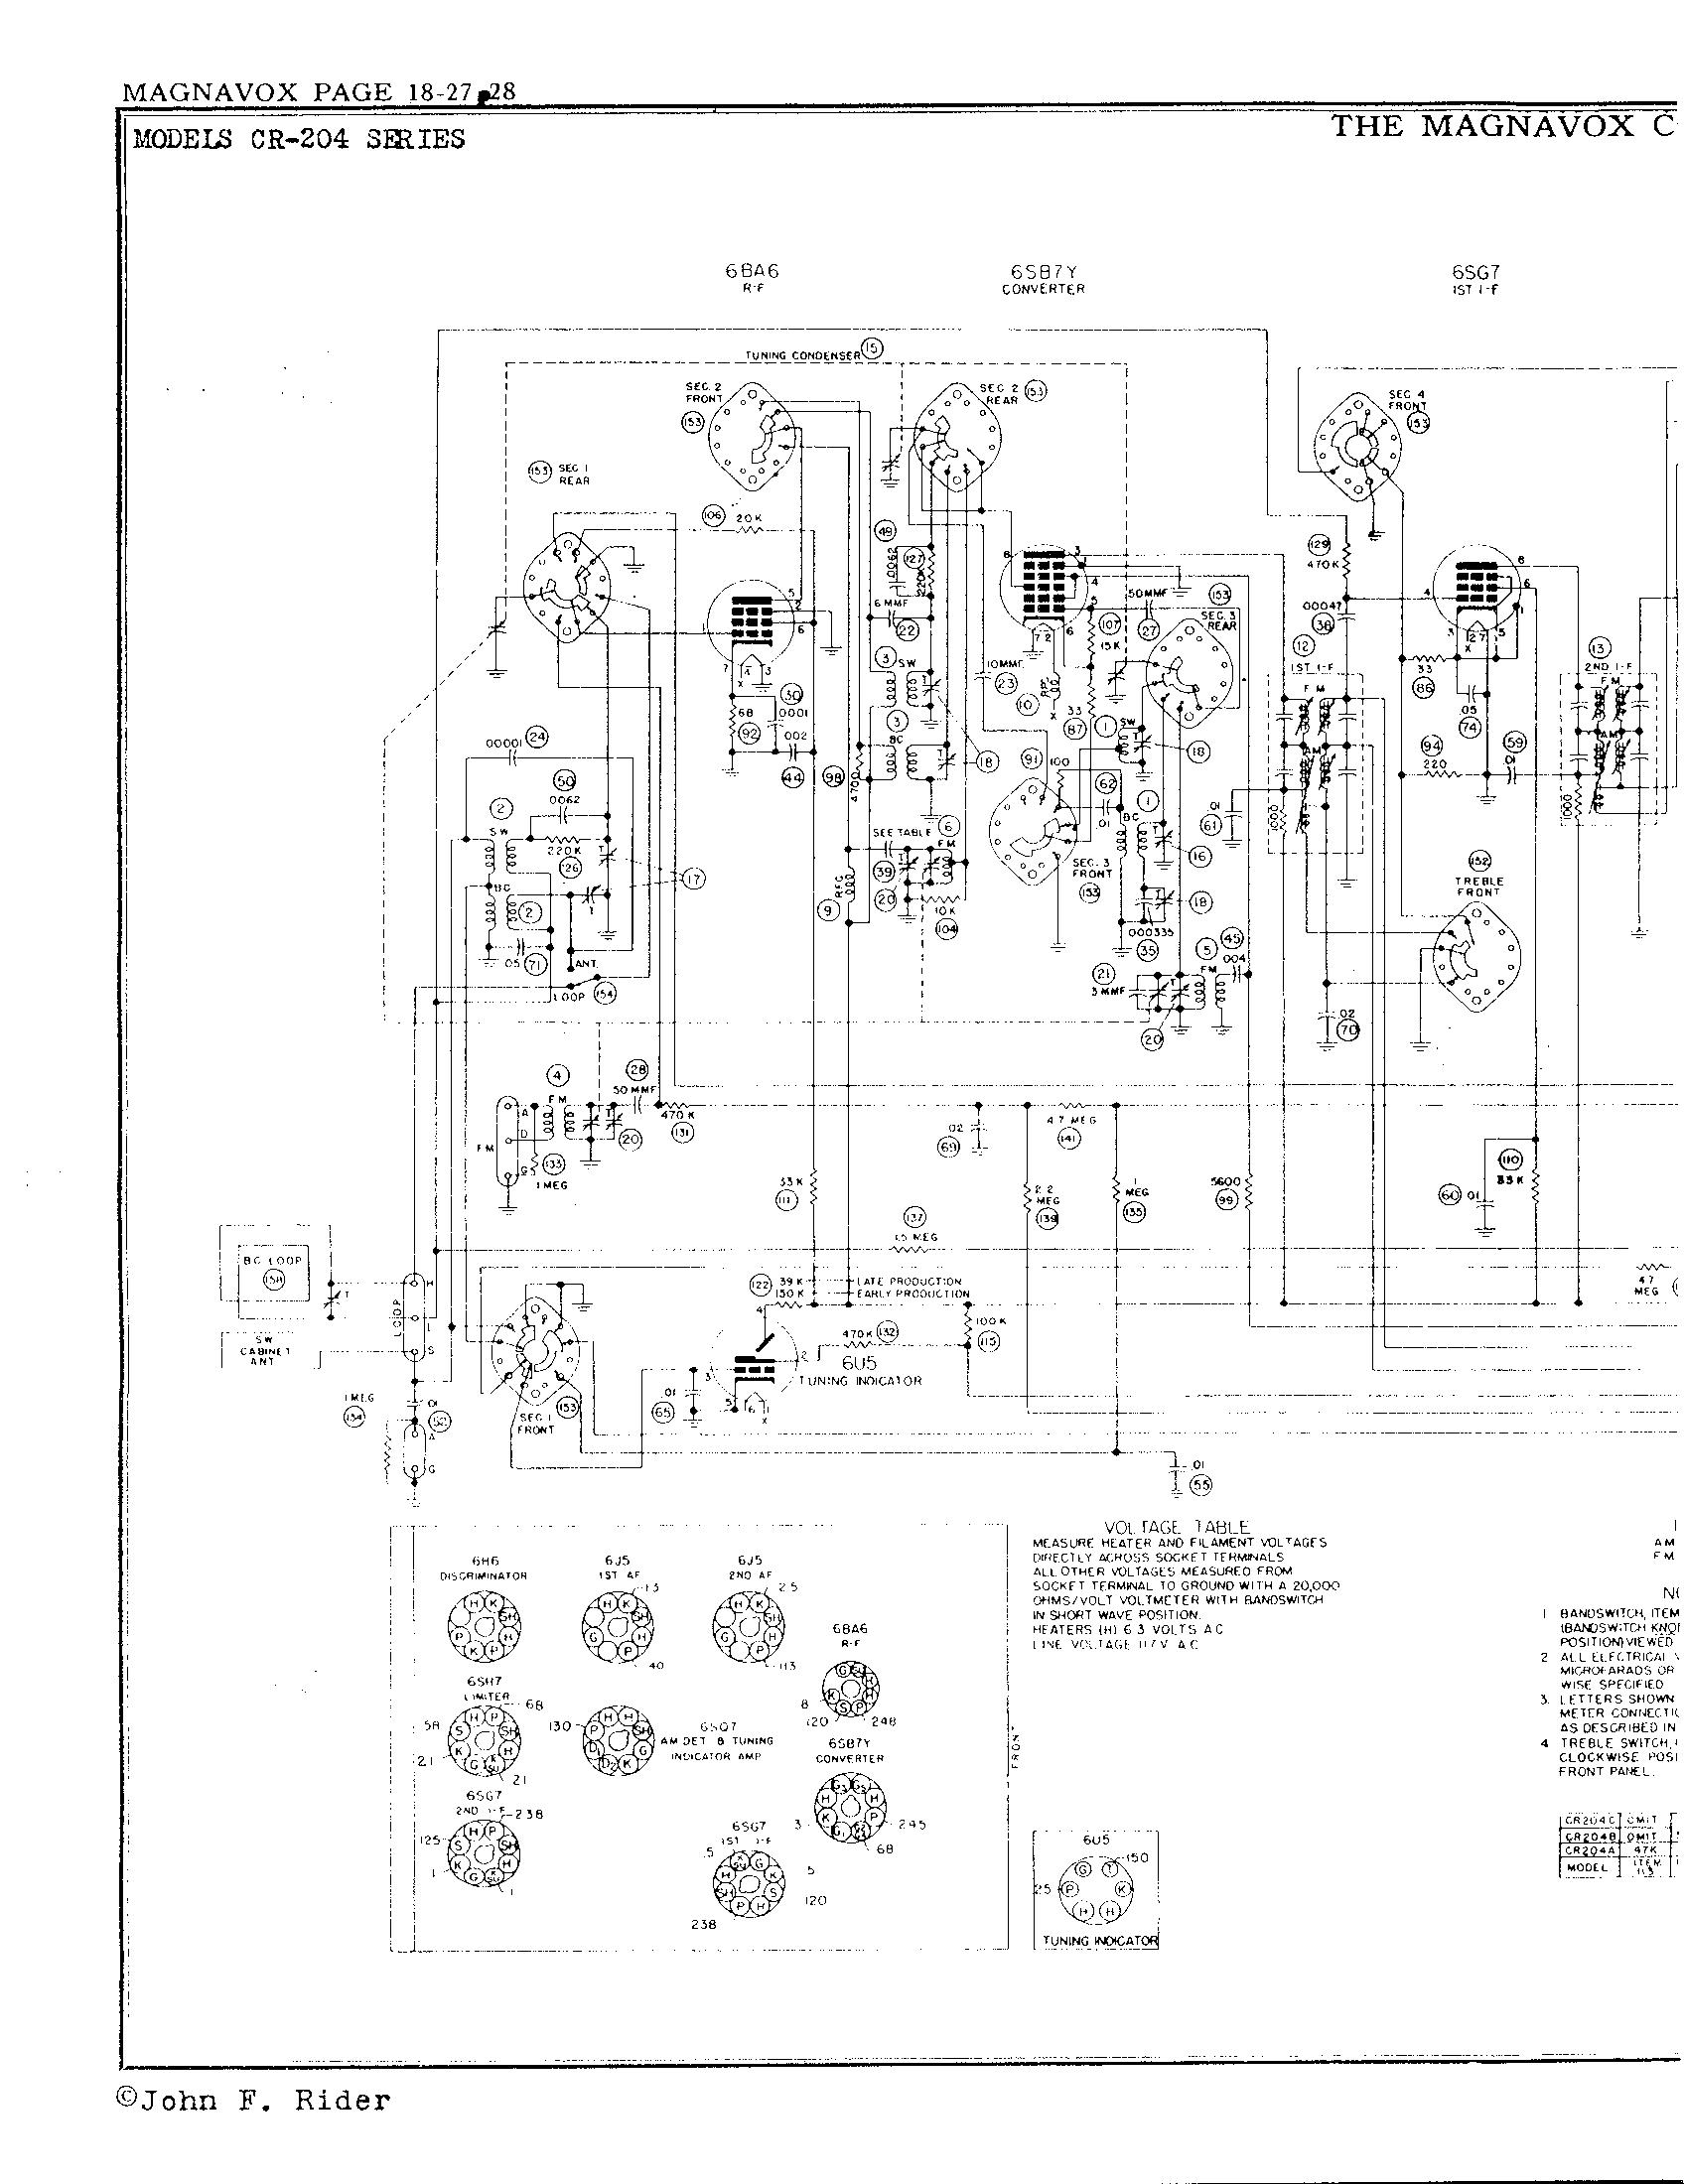 magnavox turntable plug wiring diagram complete wiring diagrams u2022 rh oldorchardfarm co 3 Prong Plug Wiring Diagram 7 Plug Wiring Diagram